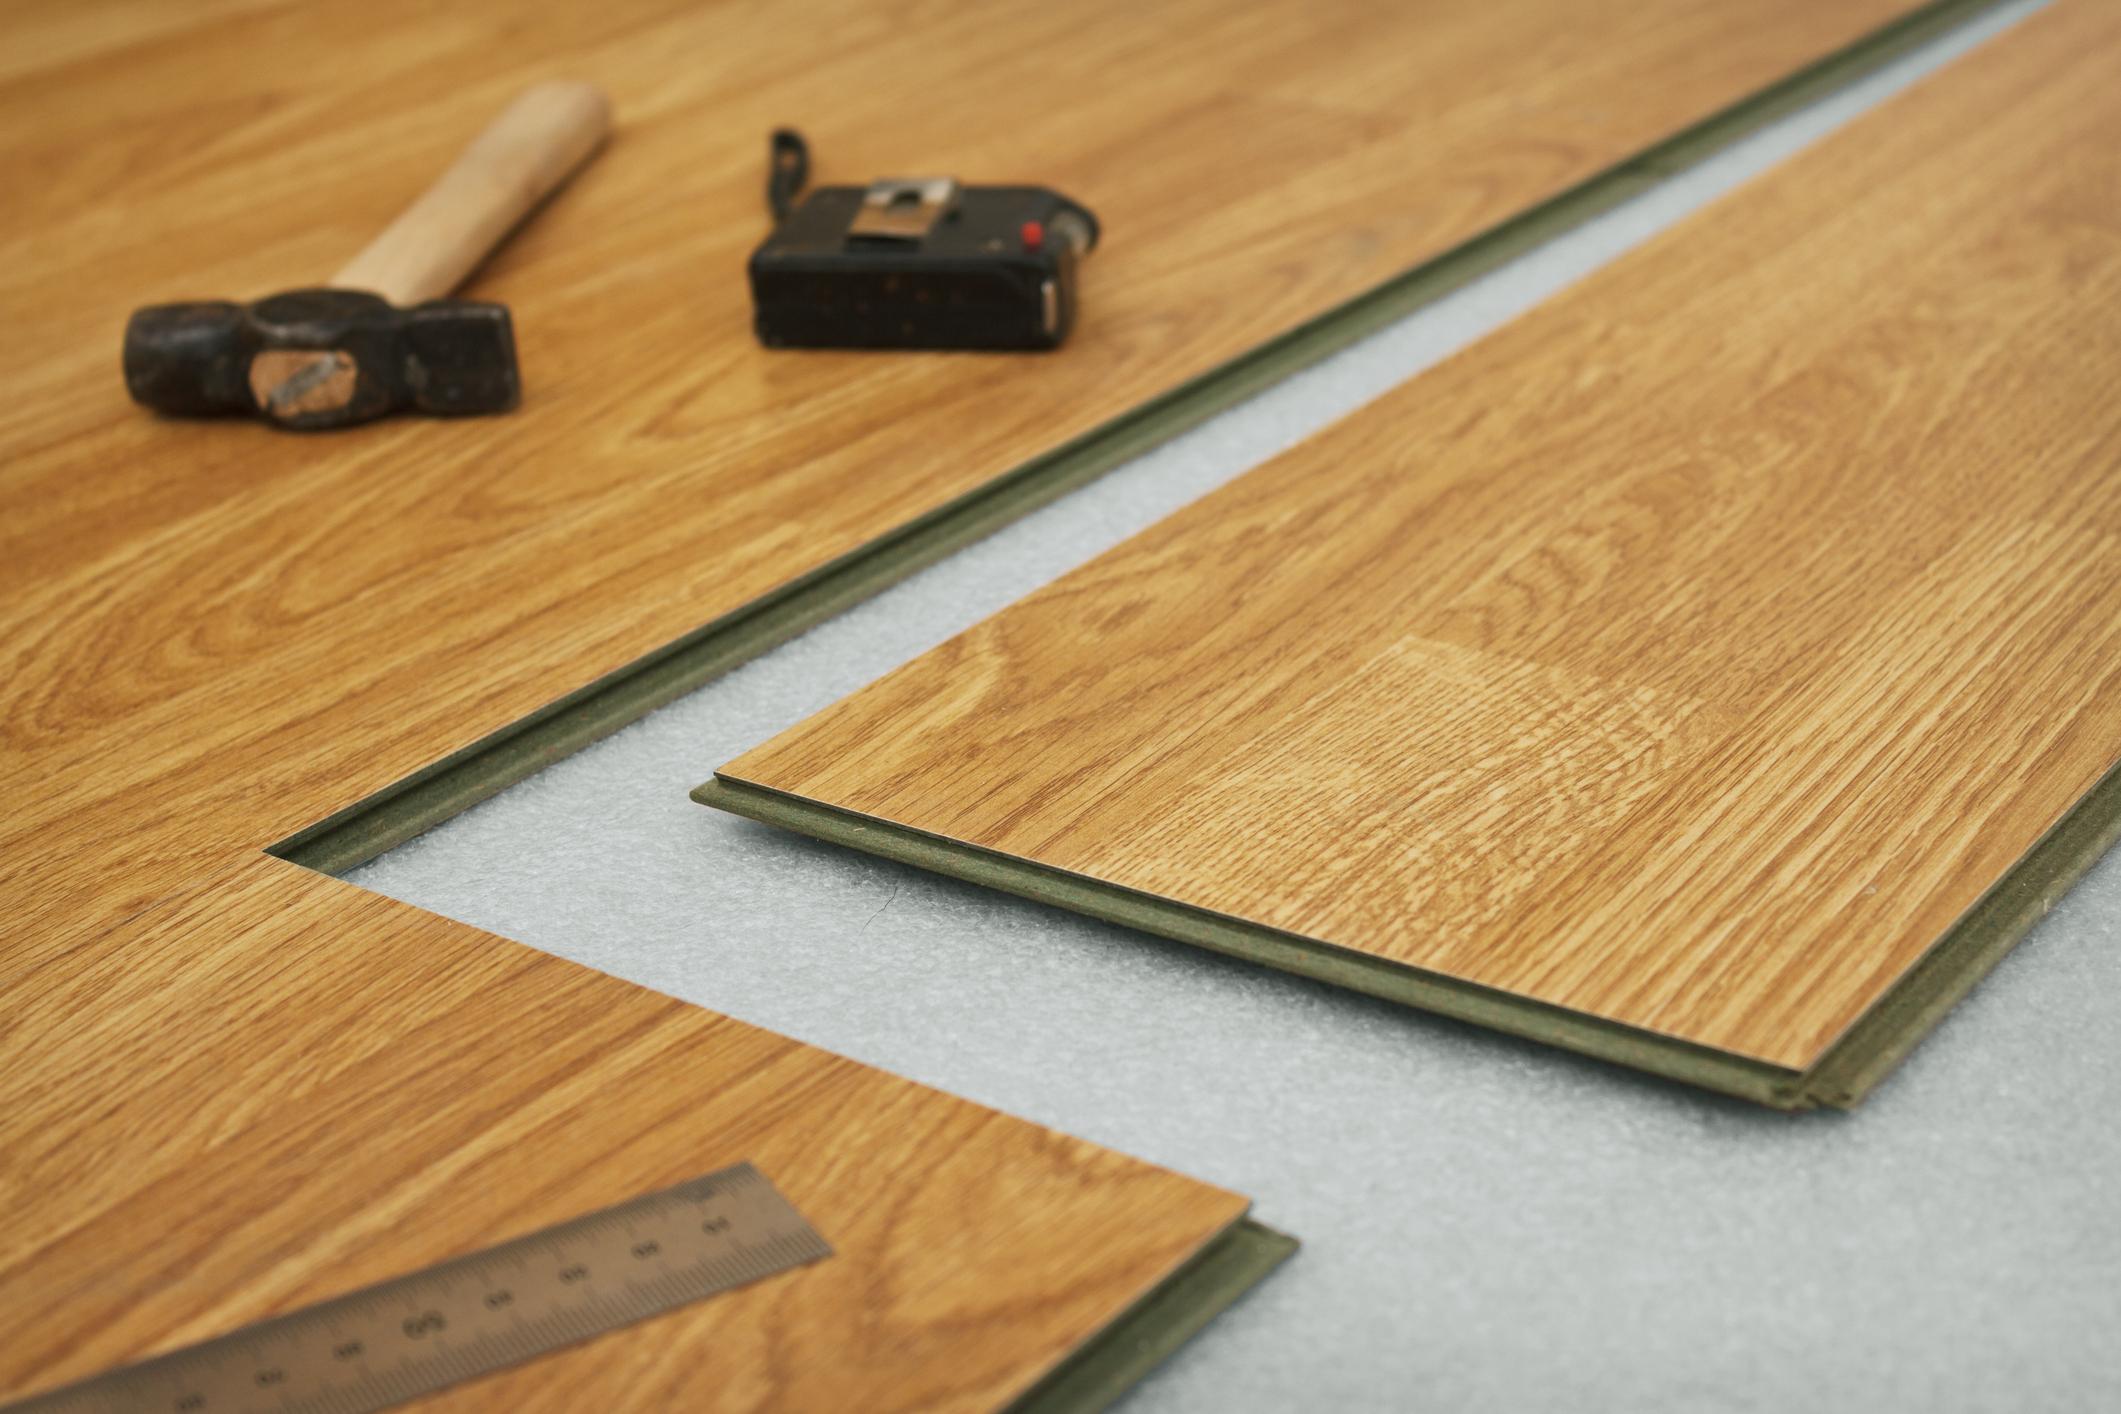 Hardwood Floors: How To Make A Good Choice